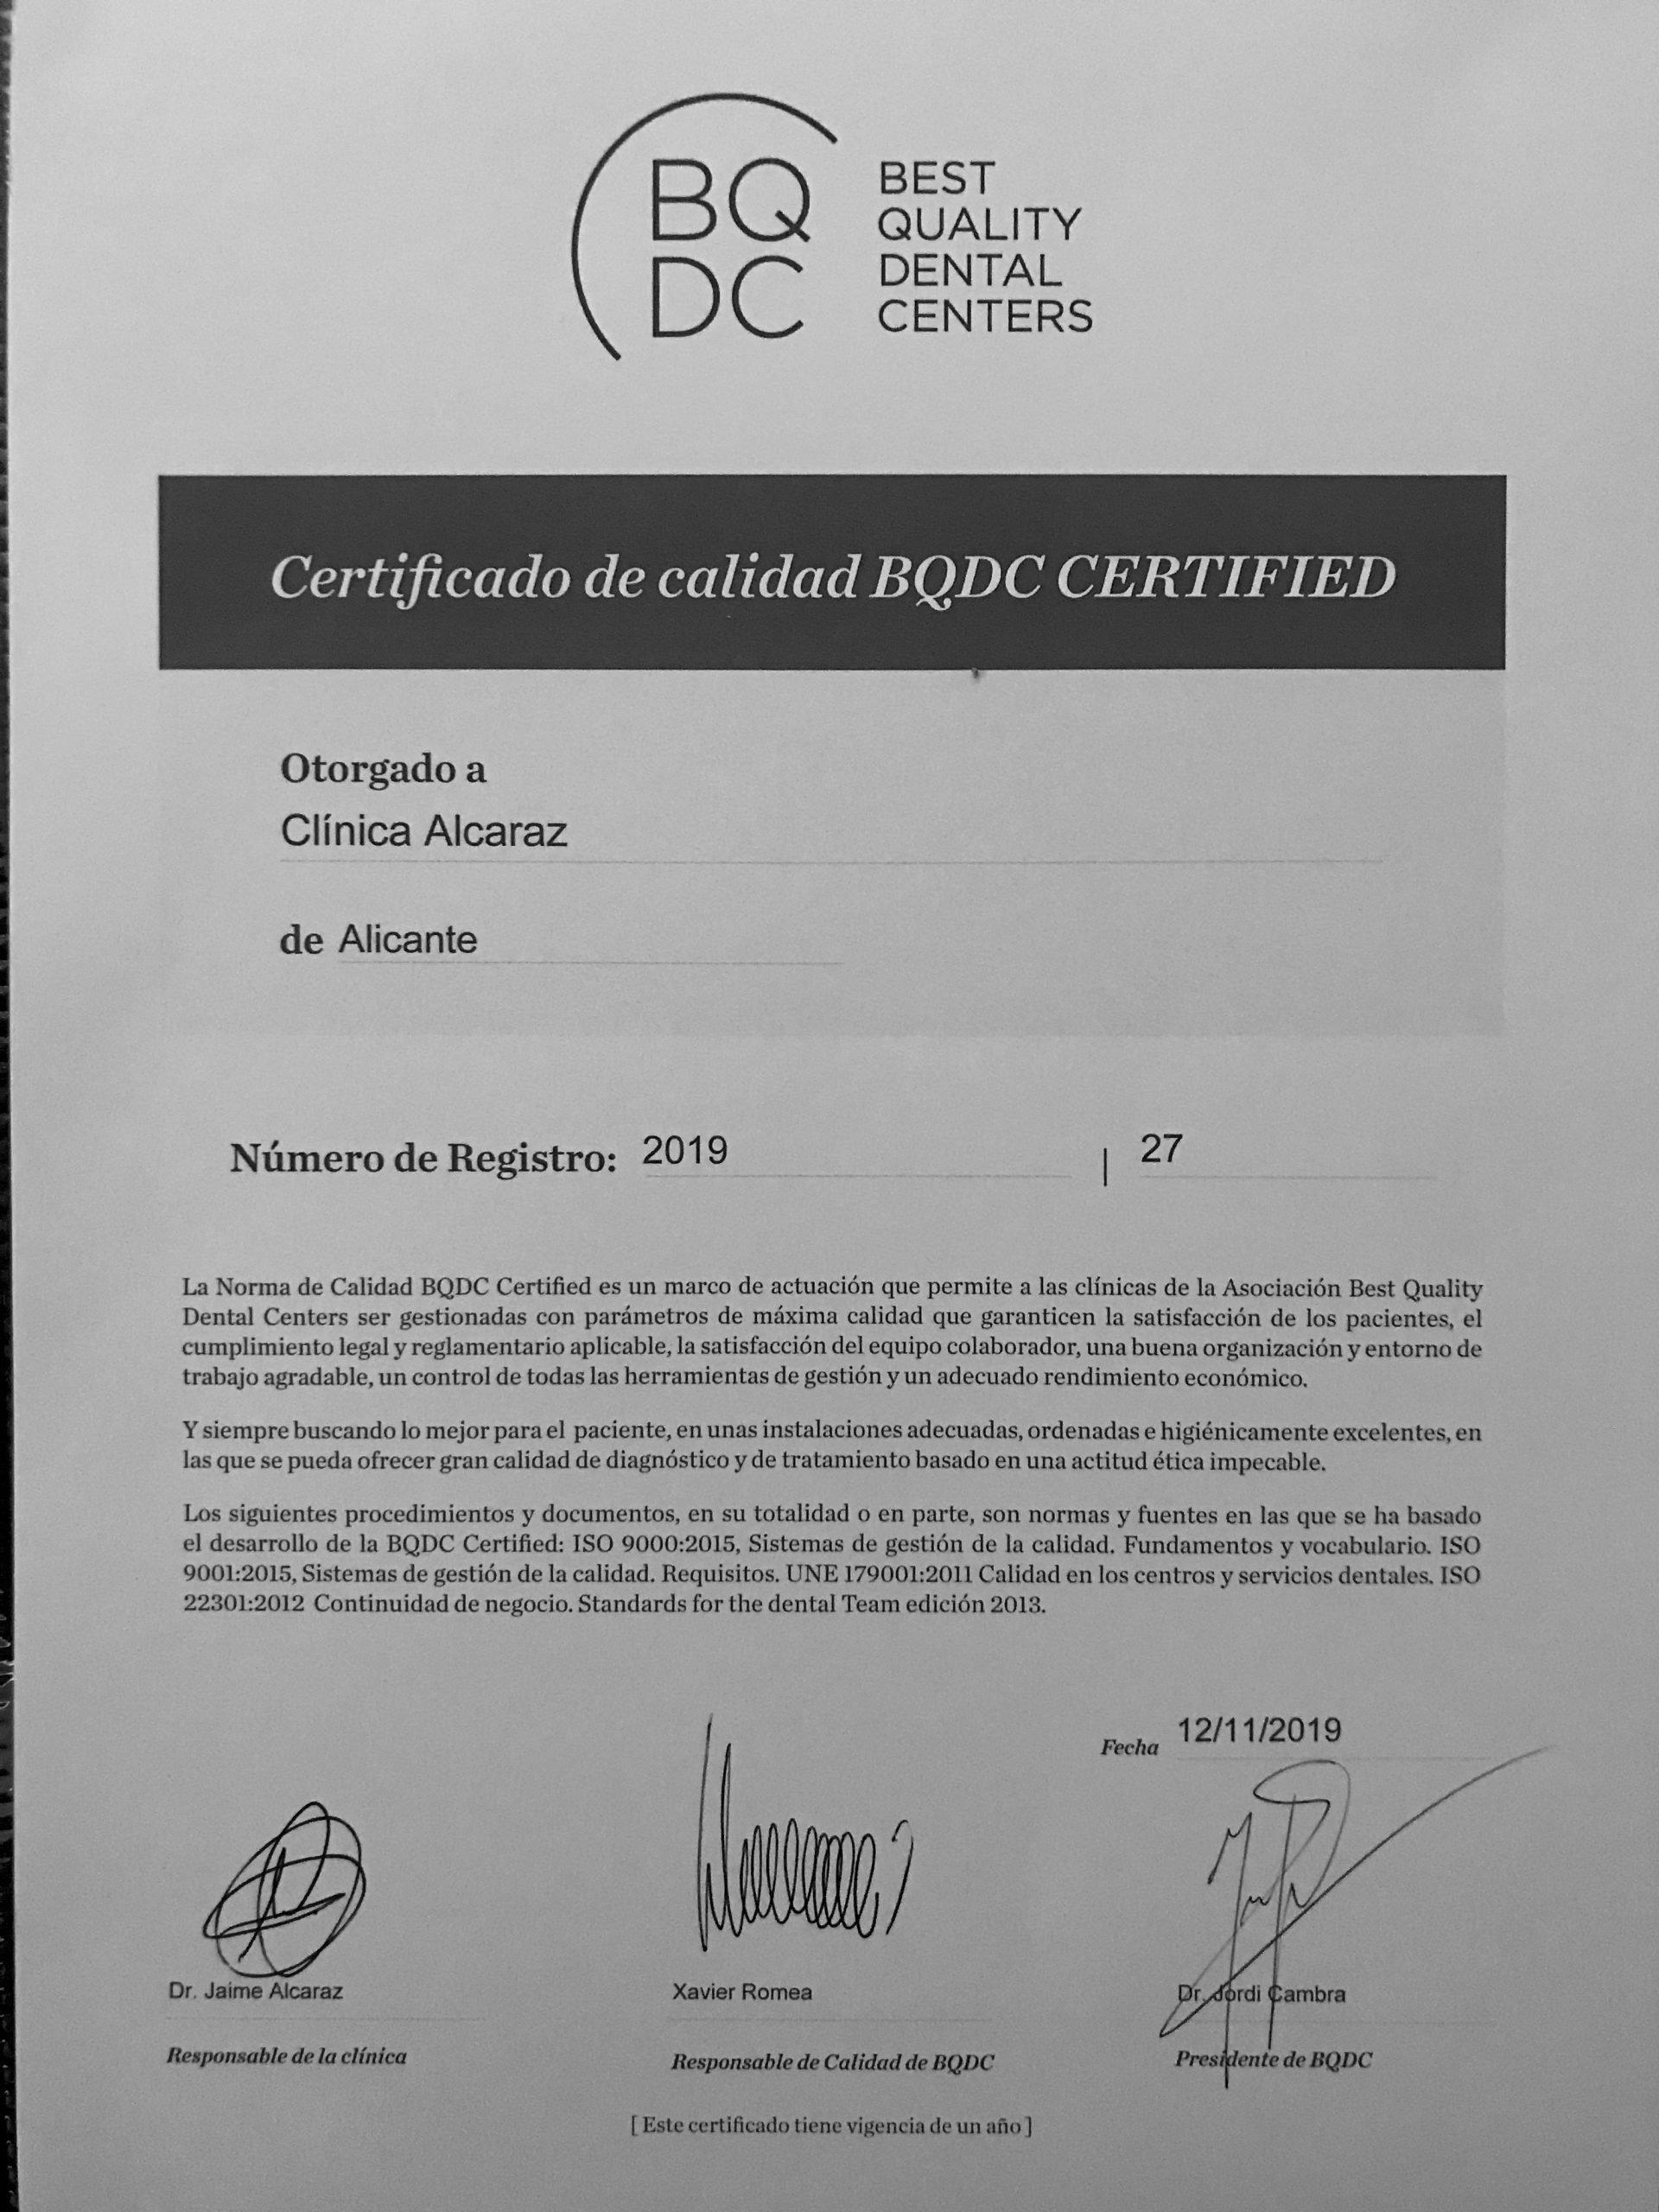 bqdc certified